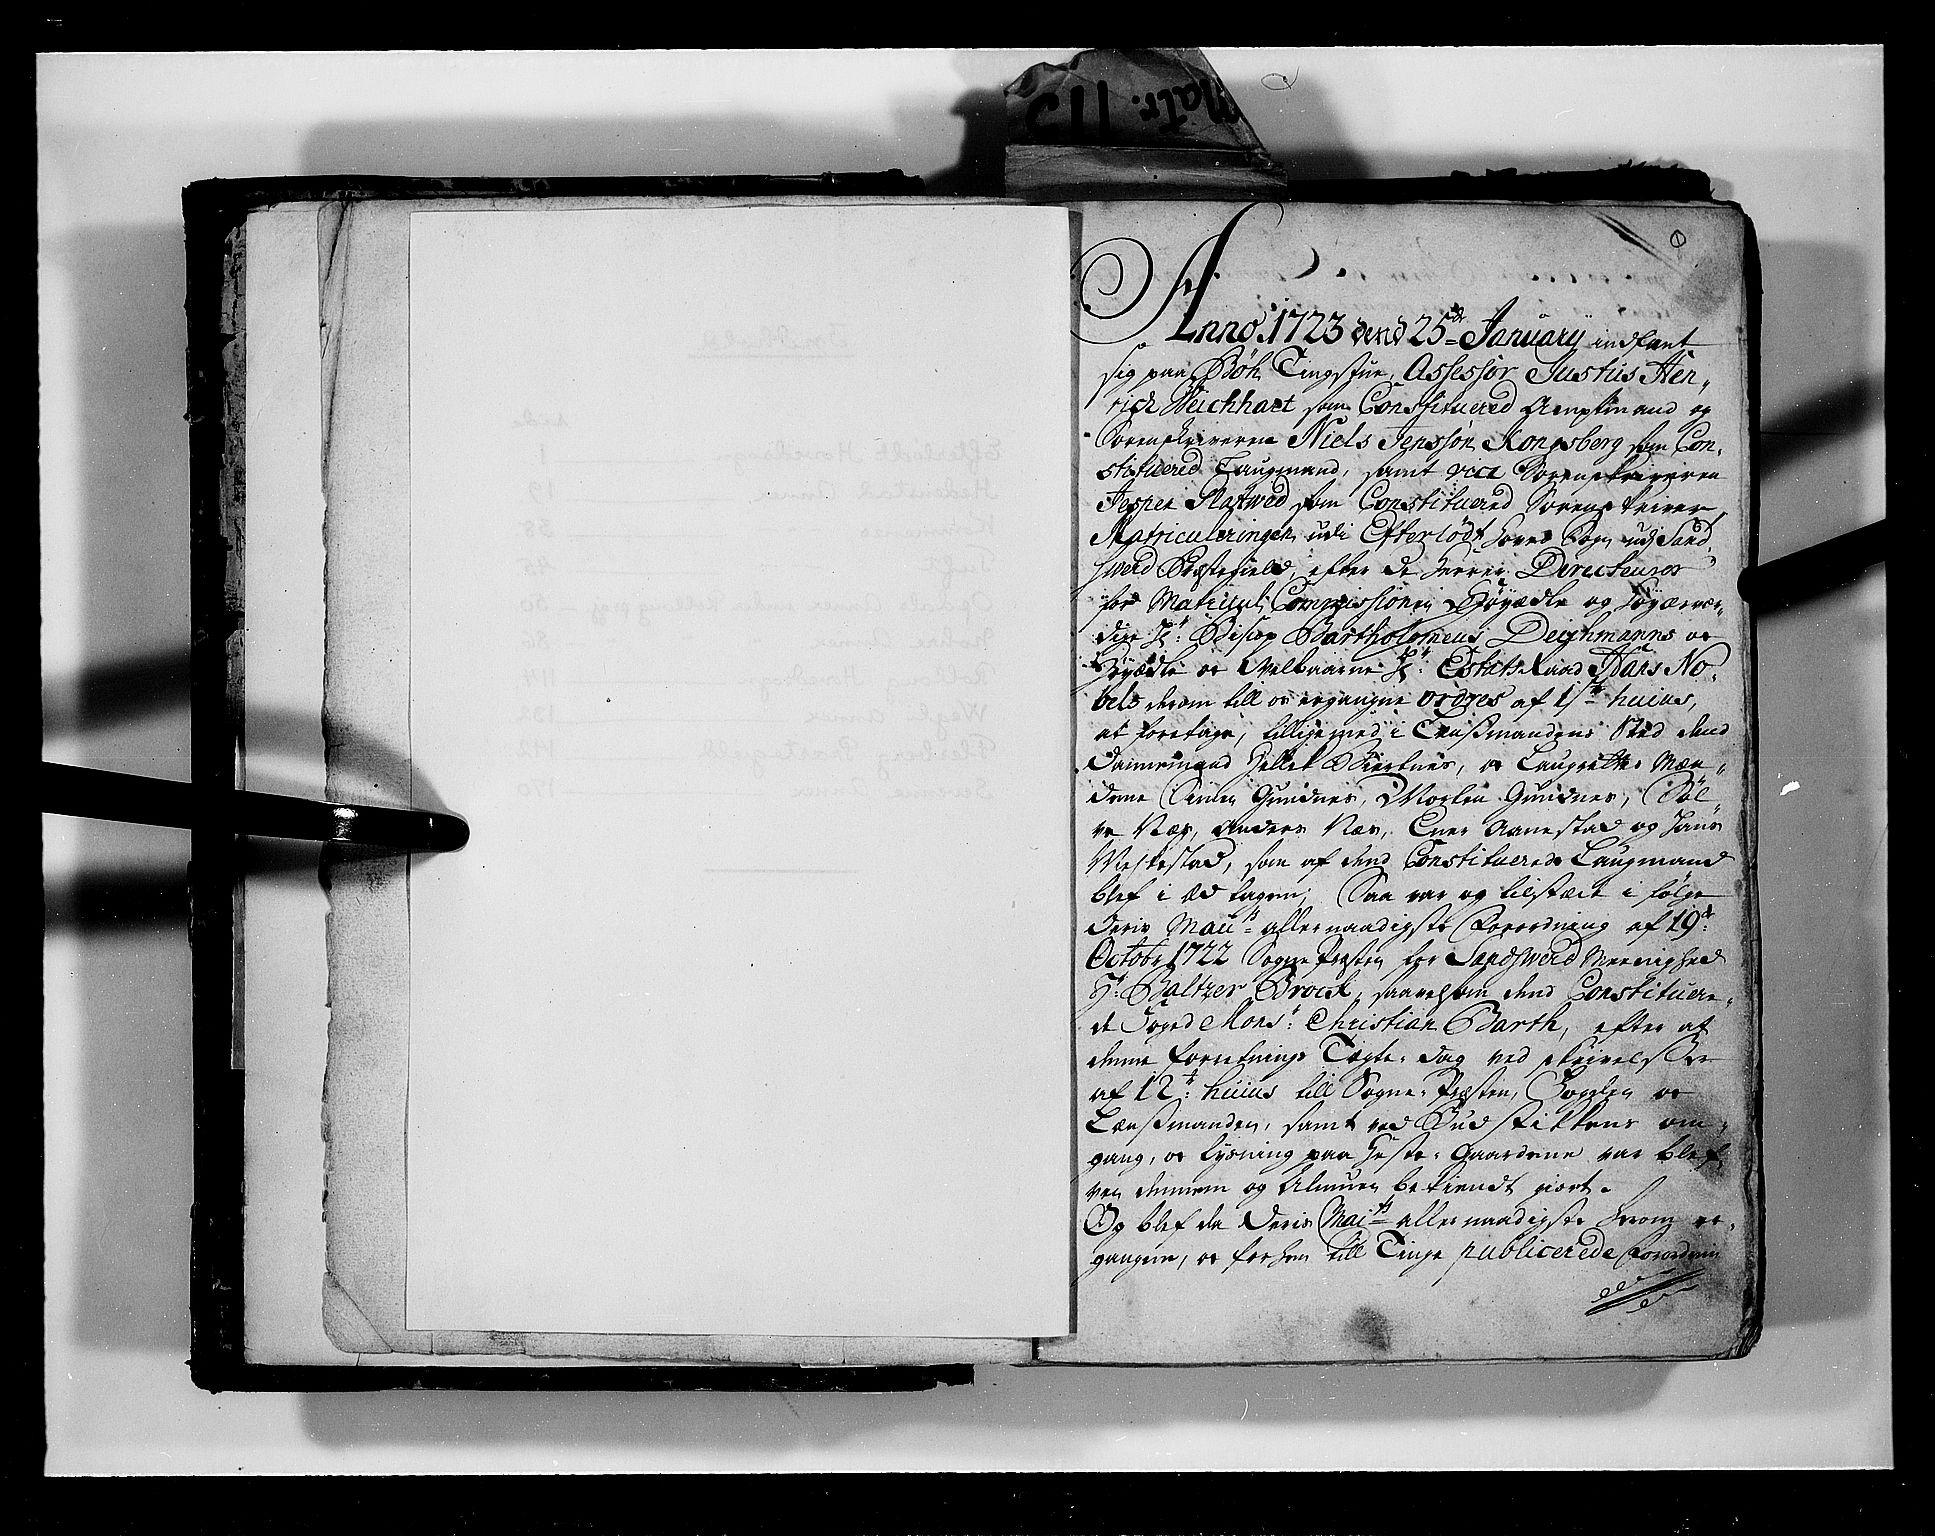 RA, Rentekammeret inntil 1814, Realistisk ordnet avdeling, N/Nb/Nbf/L0113: Numedal og Sandsvær eksaminasjonsprotokoll, 1723, s. 1a